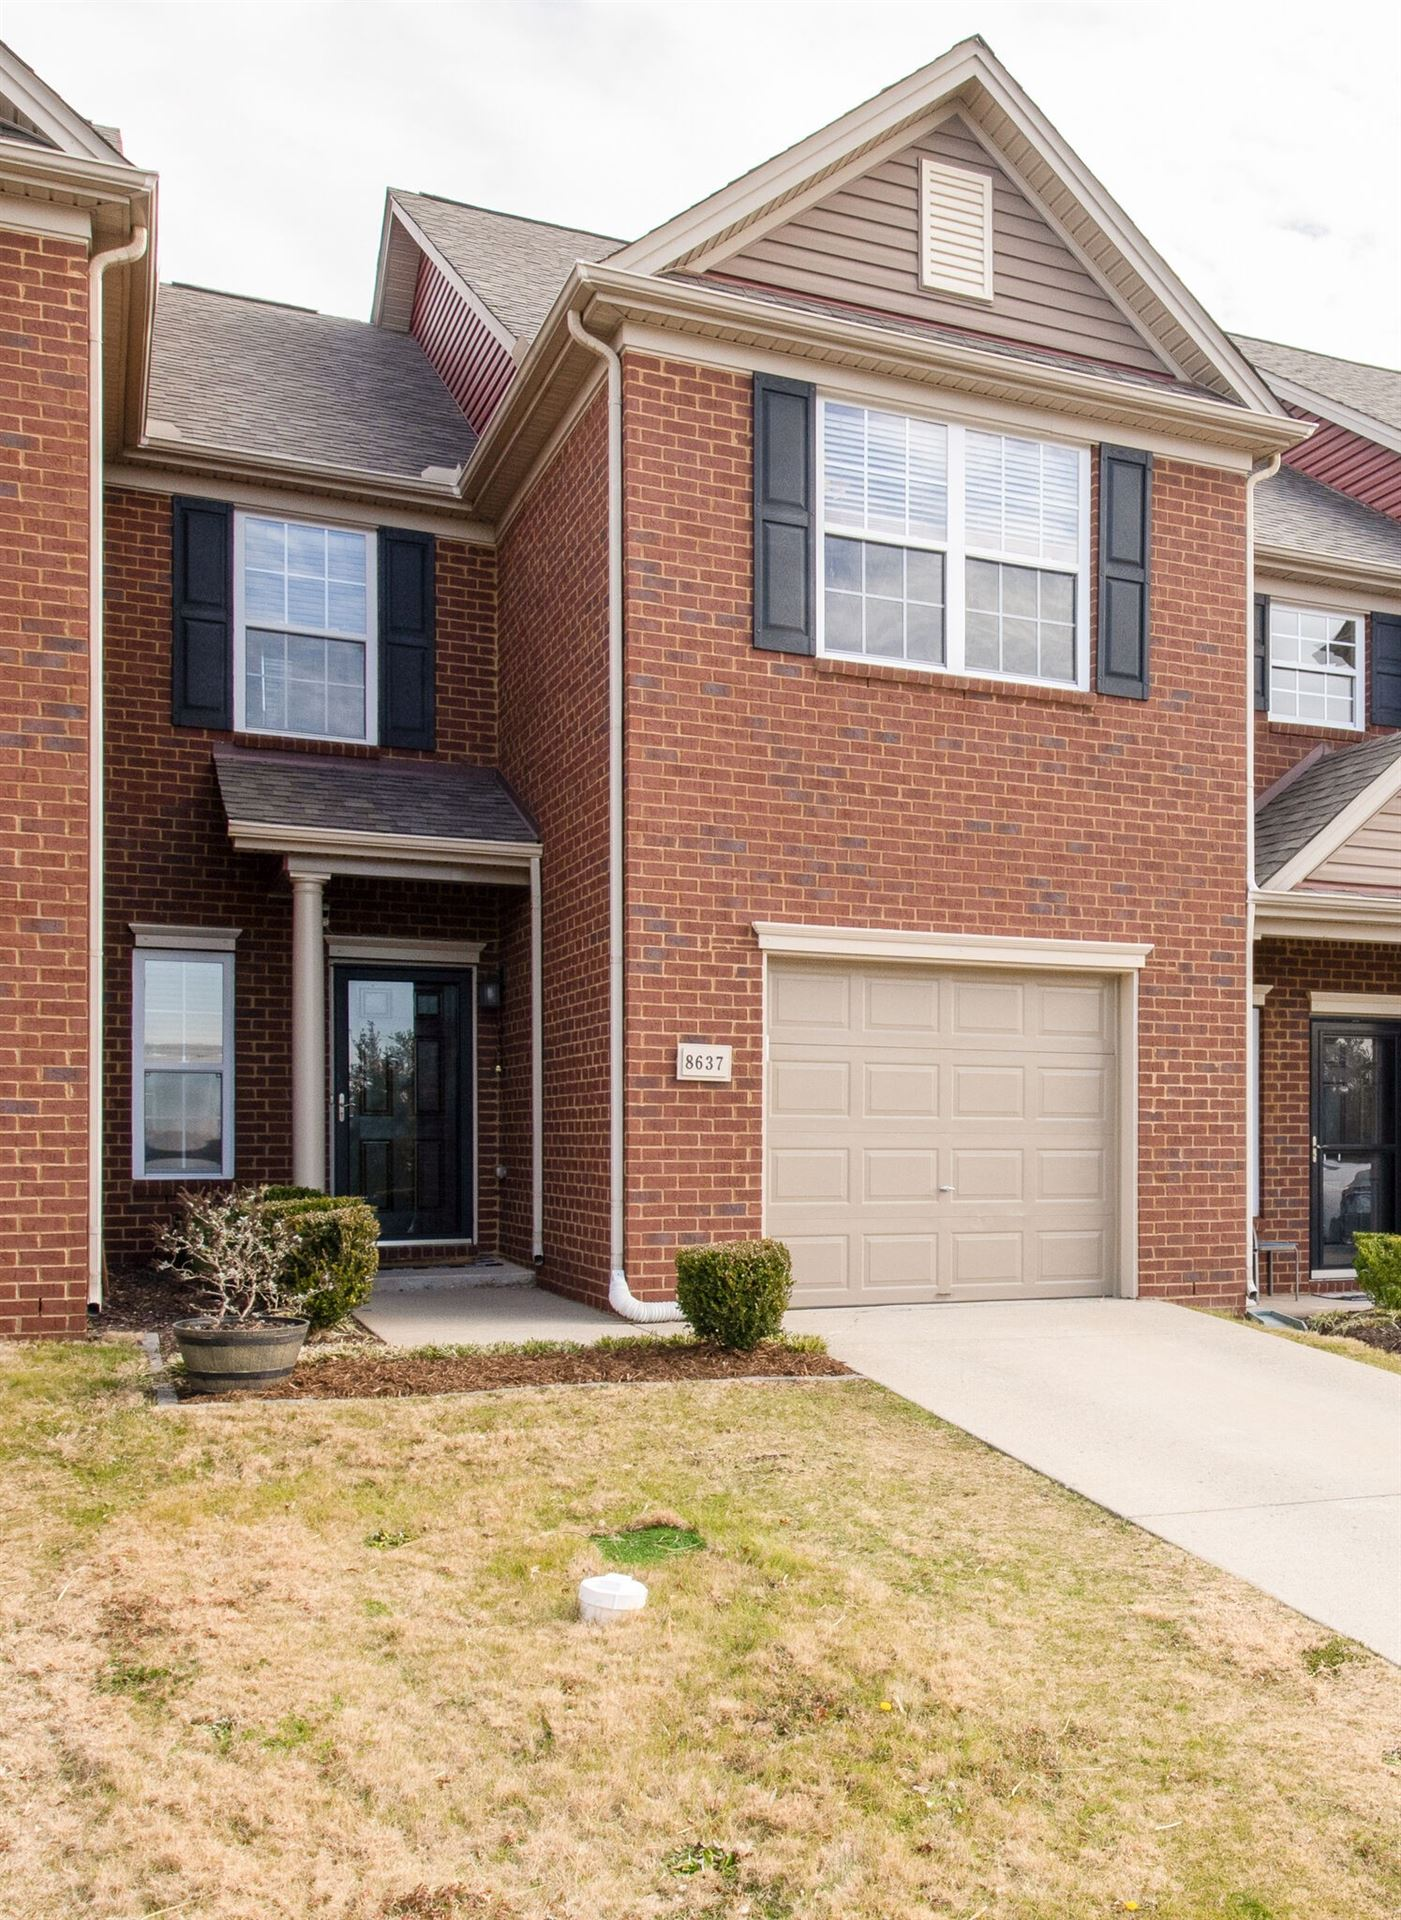 8637 Altesse Way #8637, Brentwood, TN 37027 - MLS#: 2222264